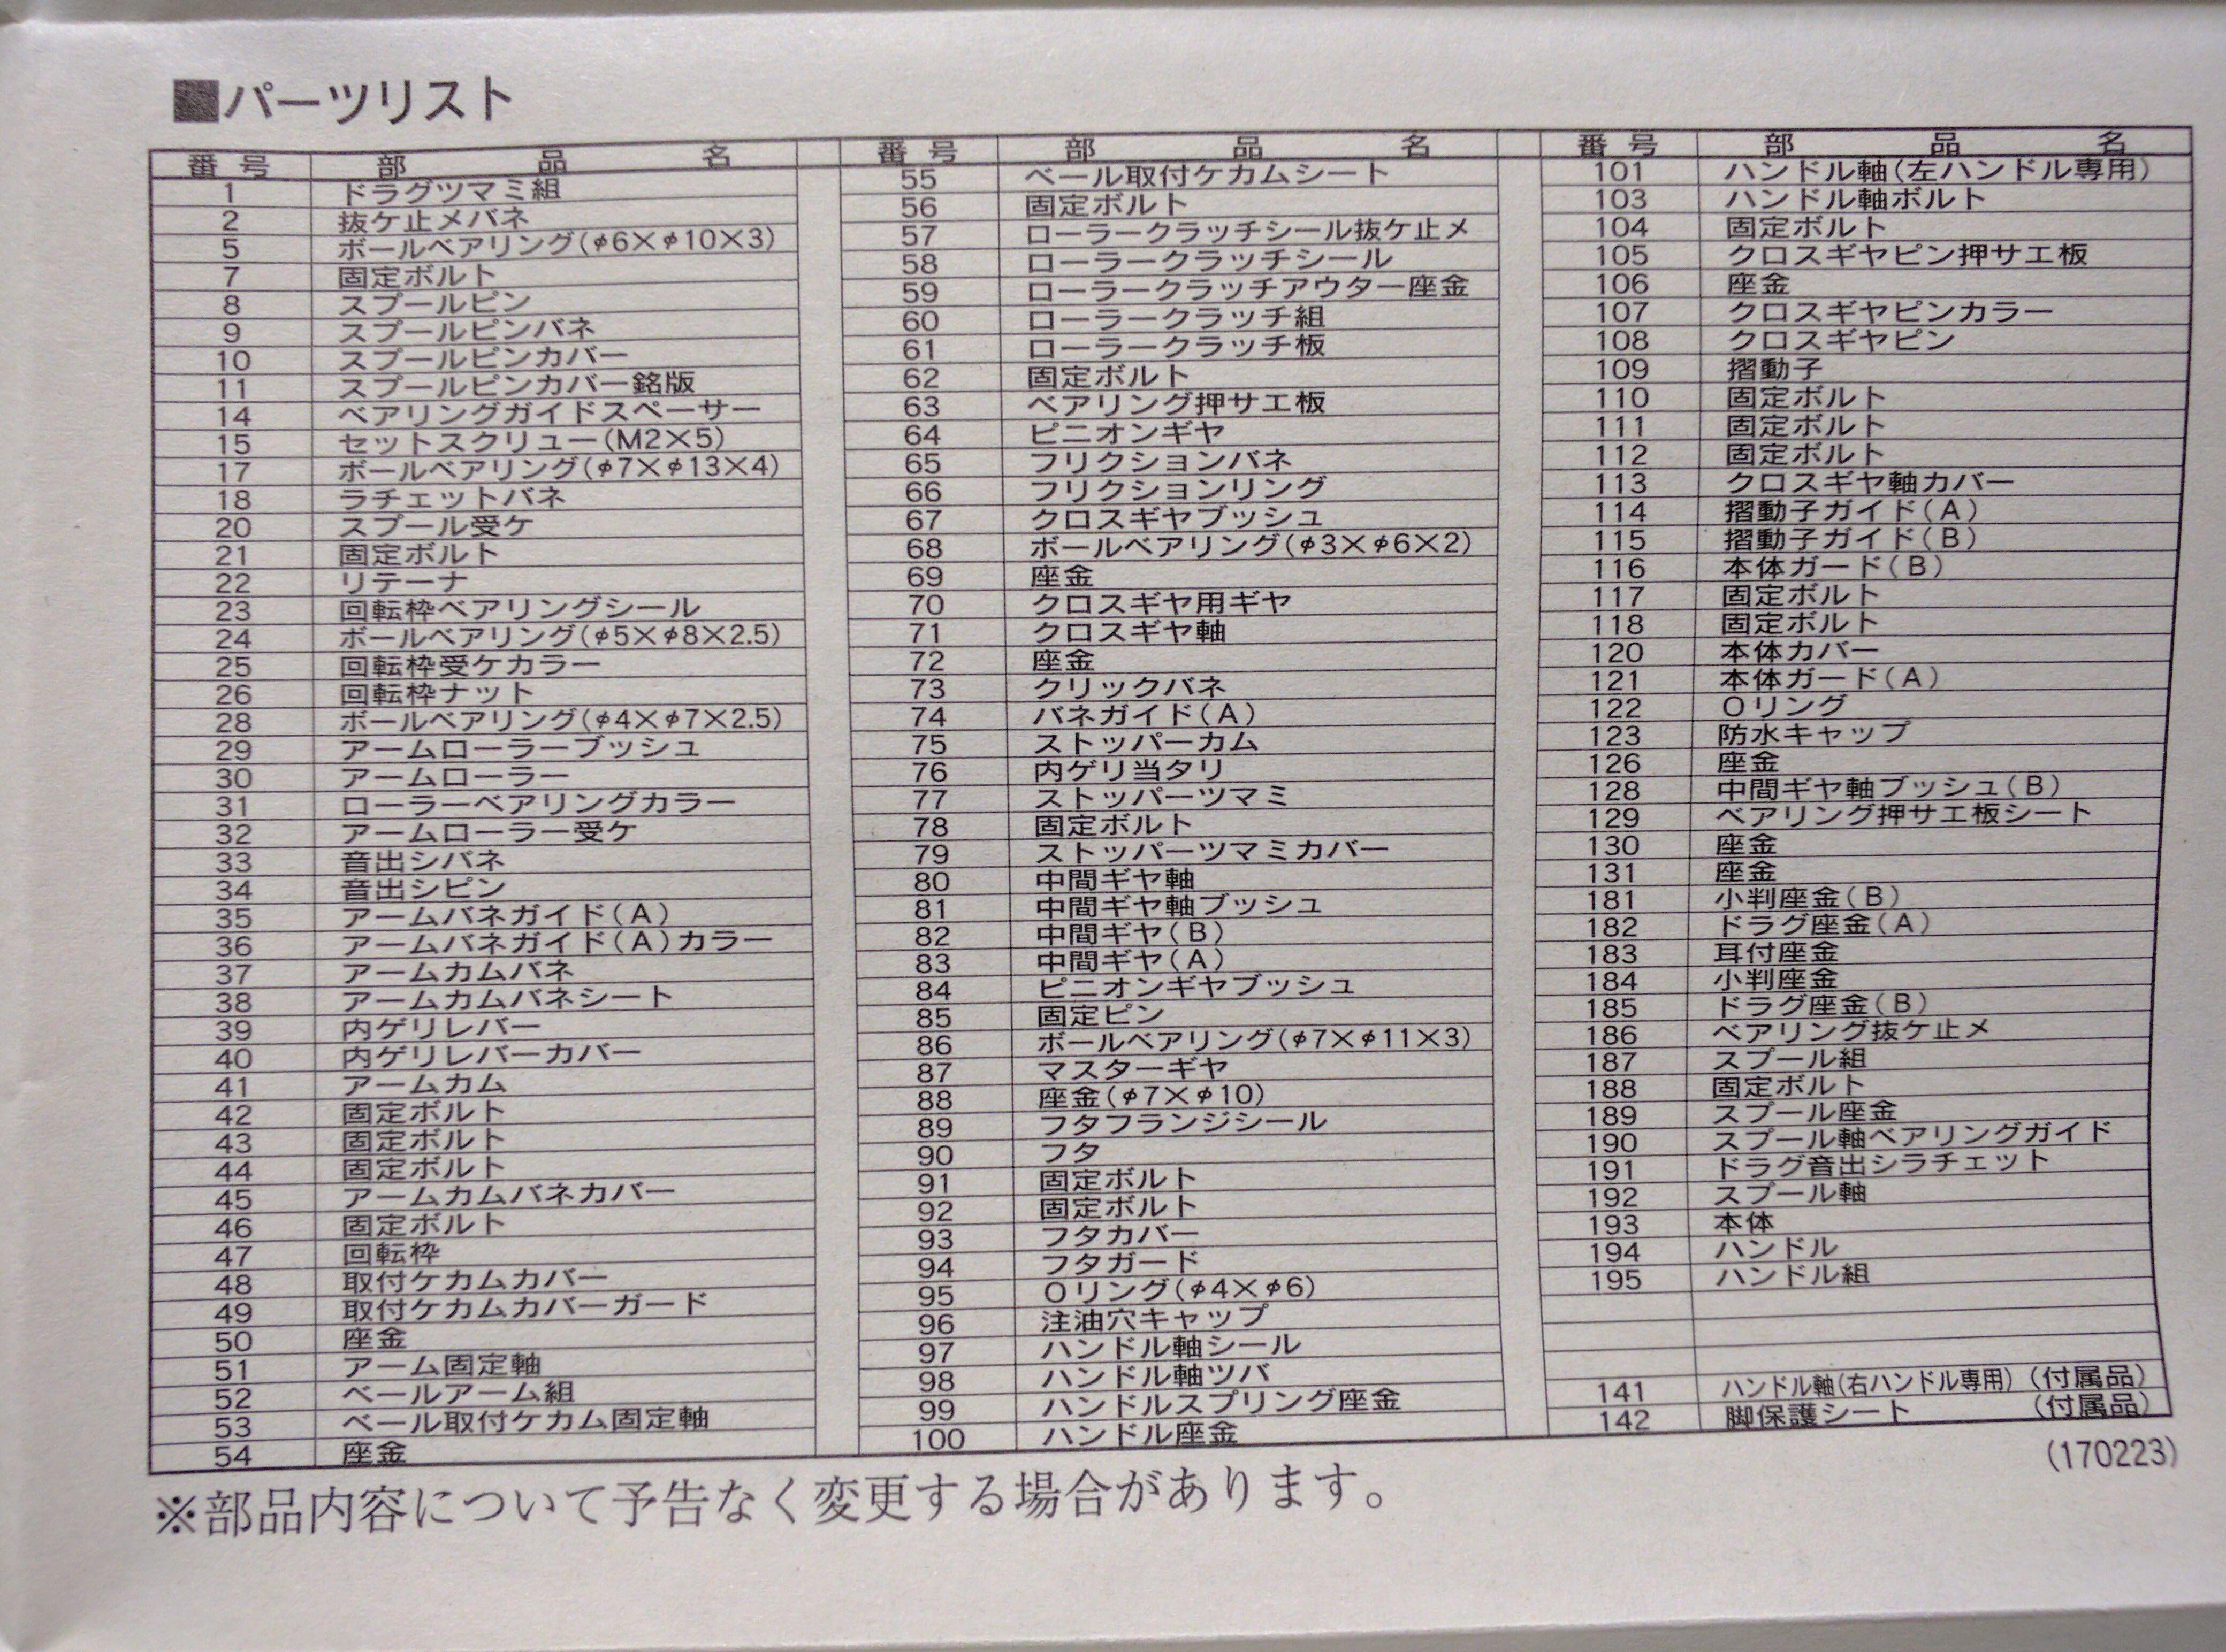 shimano-04stella-C3000-parts-list (107223)